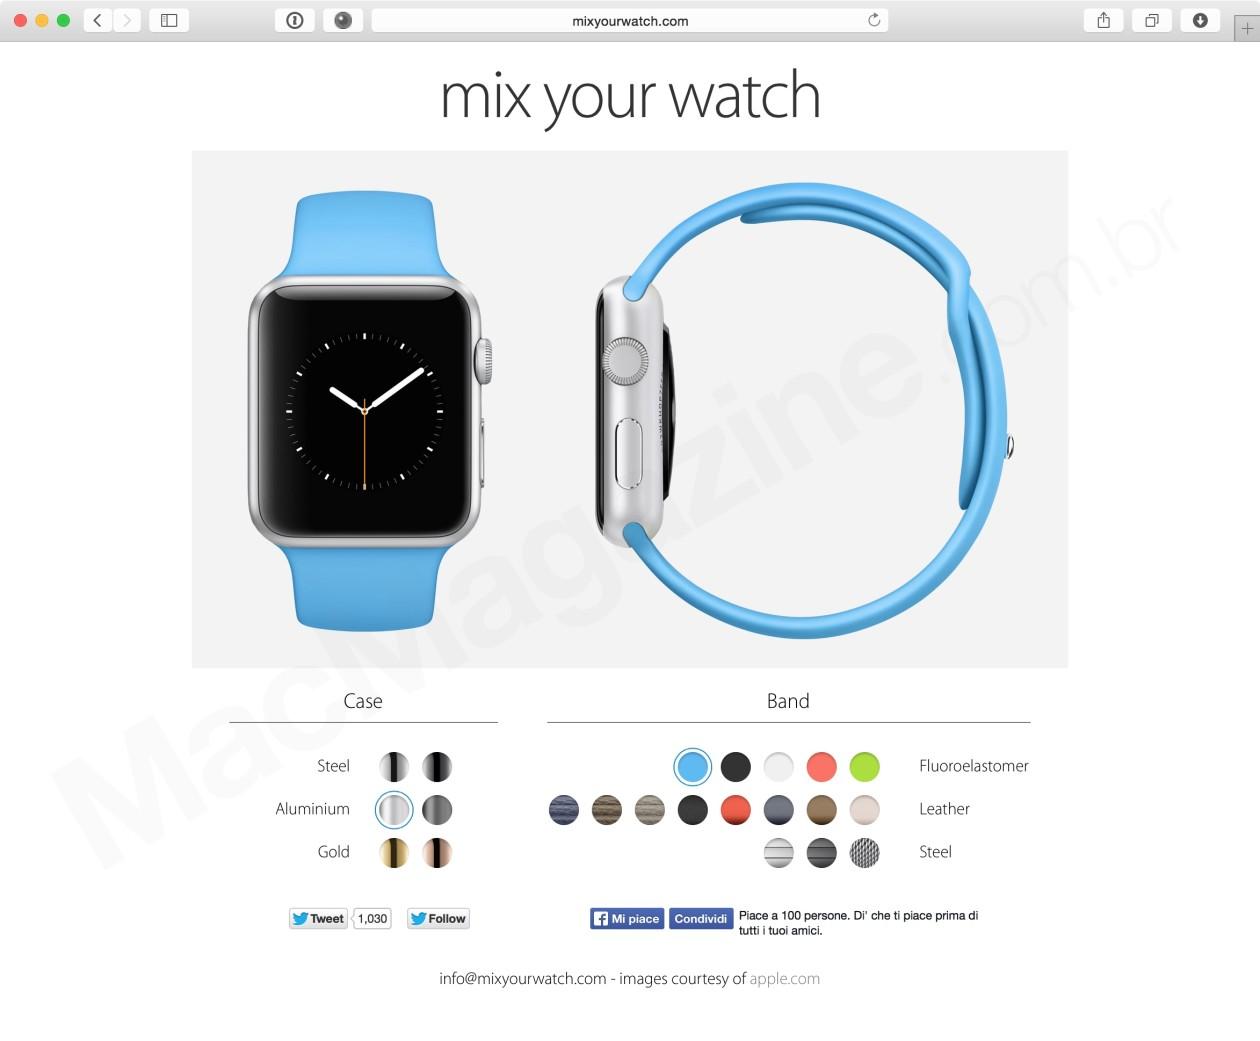 mixyourwatch